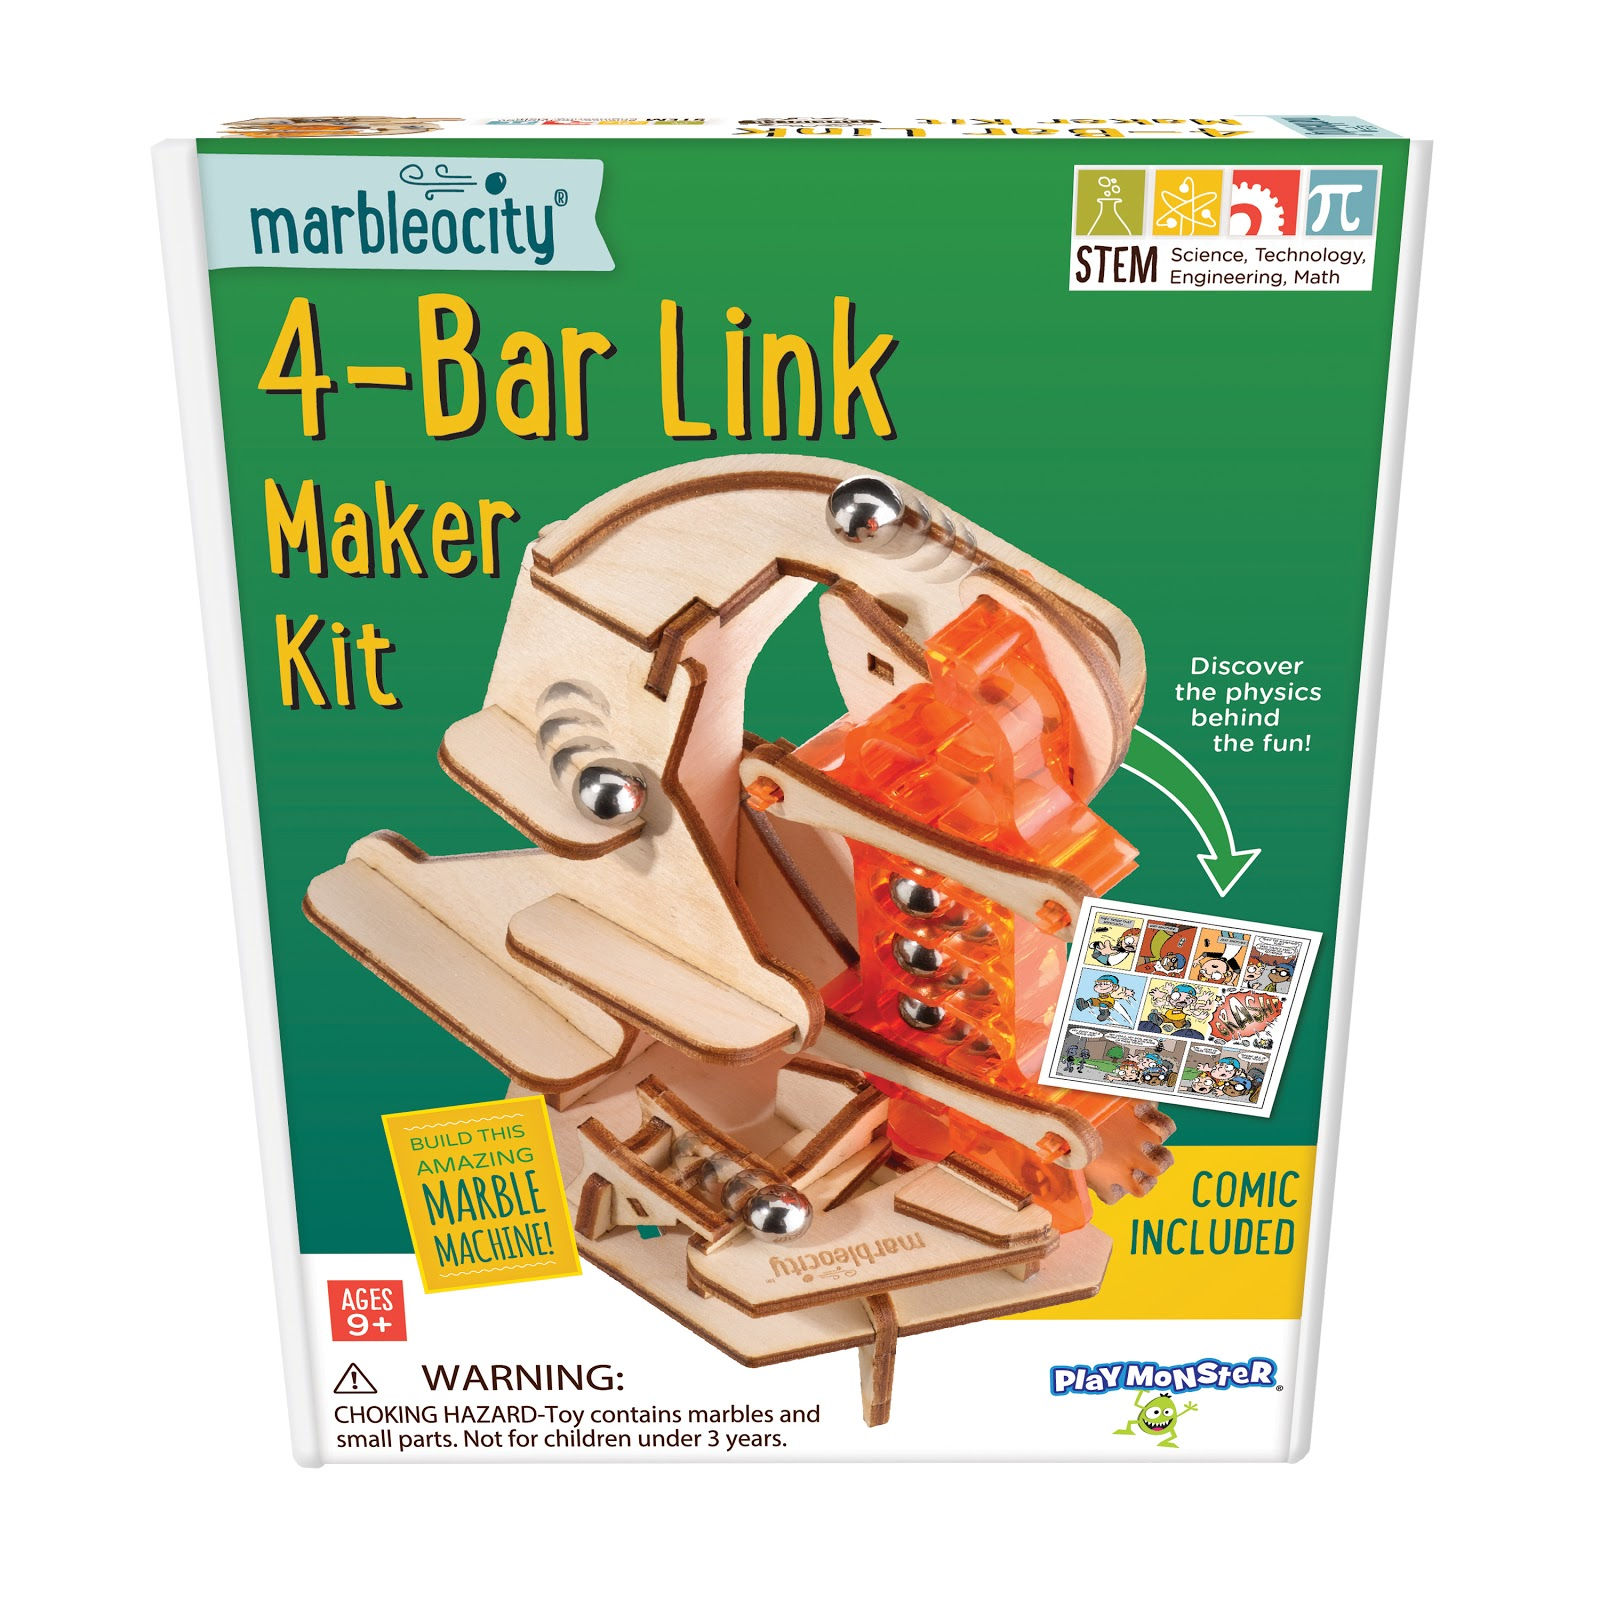 Marbleocity 4-Bar Link